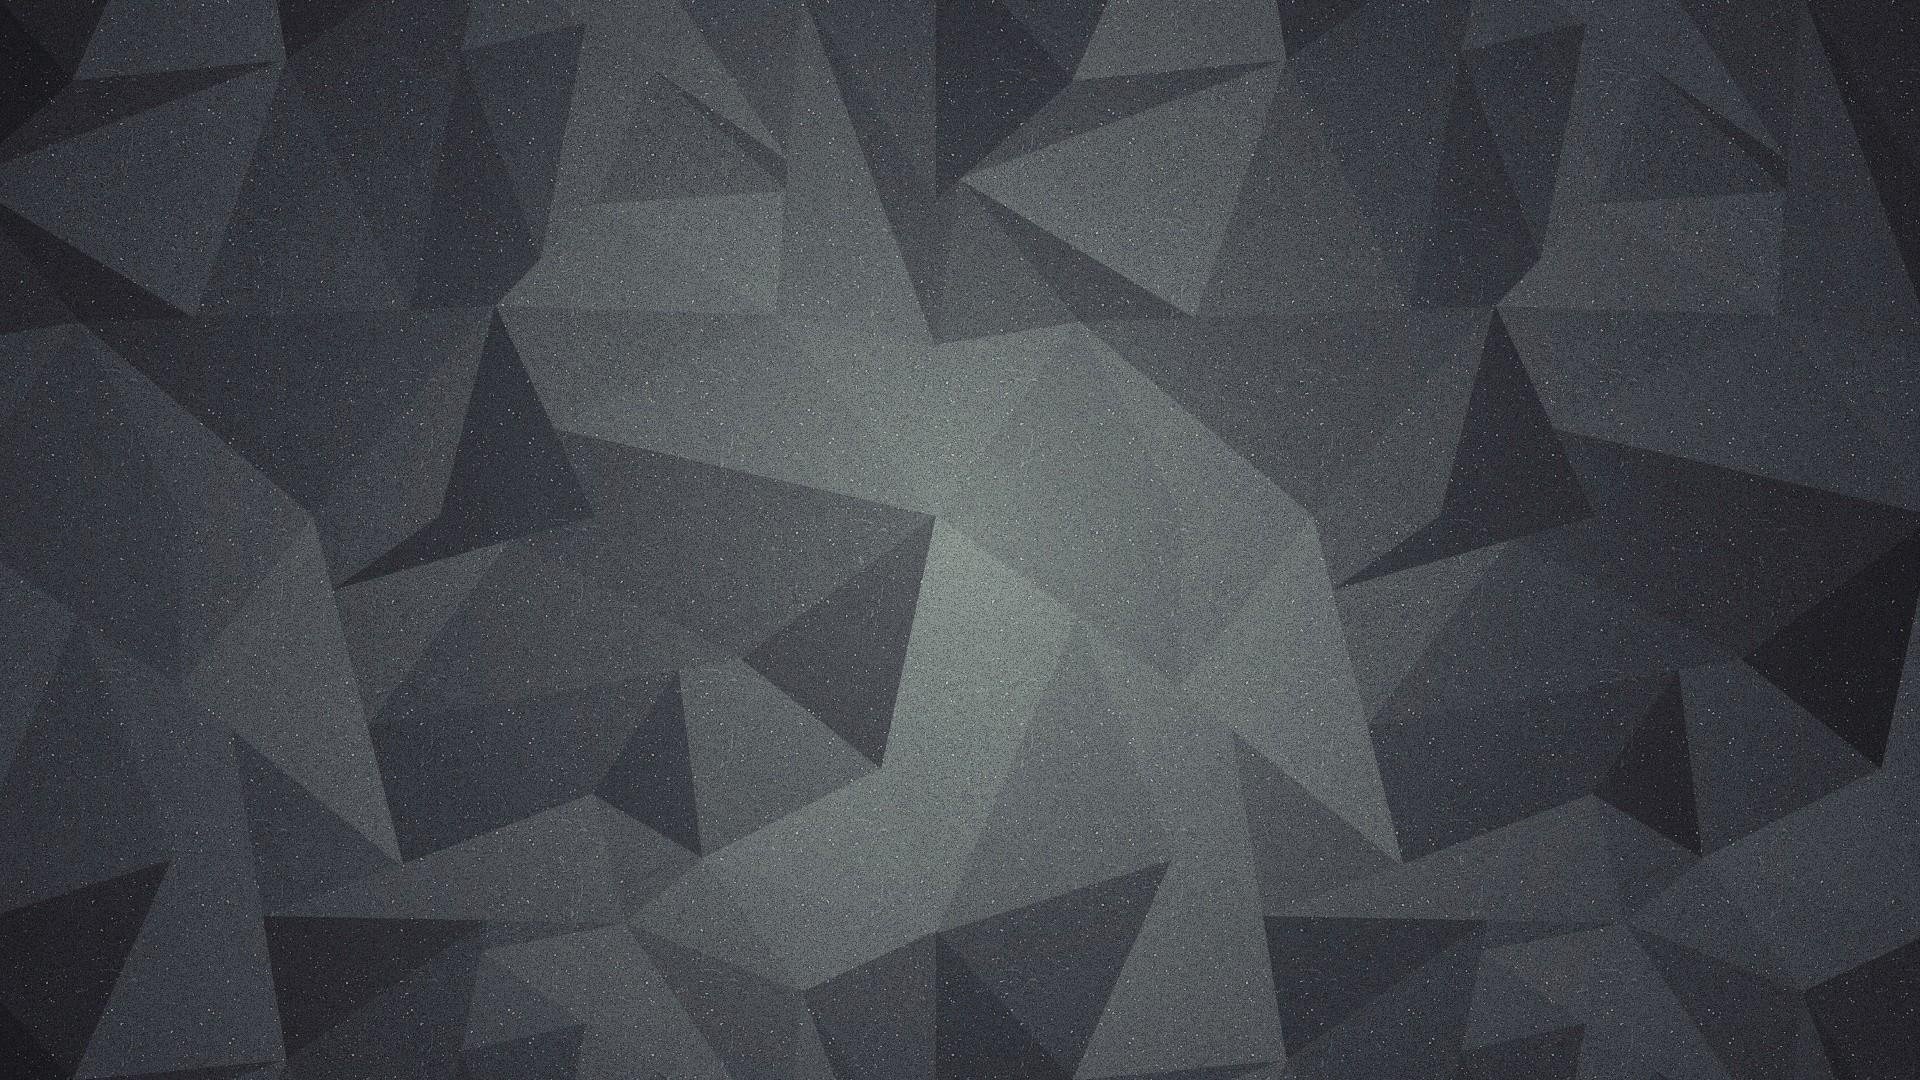 Wallpaper Digital Art Abstract Minimalism Symmetry Green